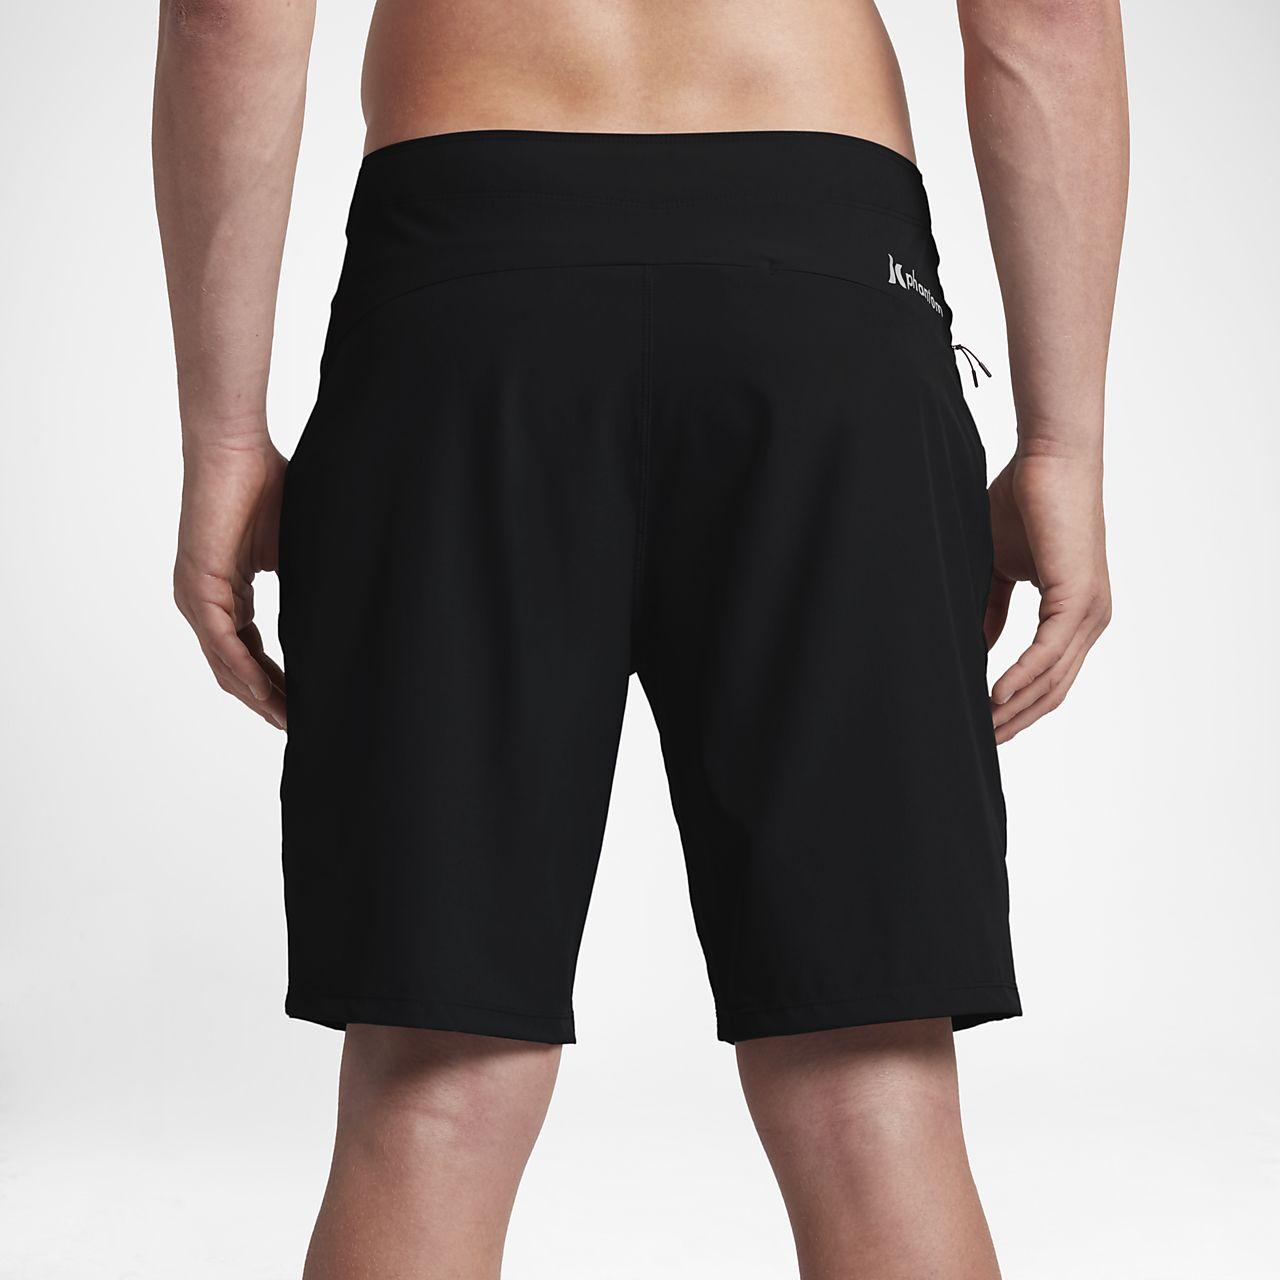 Nike Mens Boardshorts - Nike Hurley Phantom One And Only 21